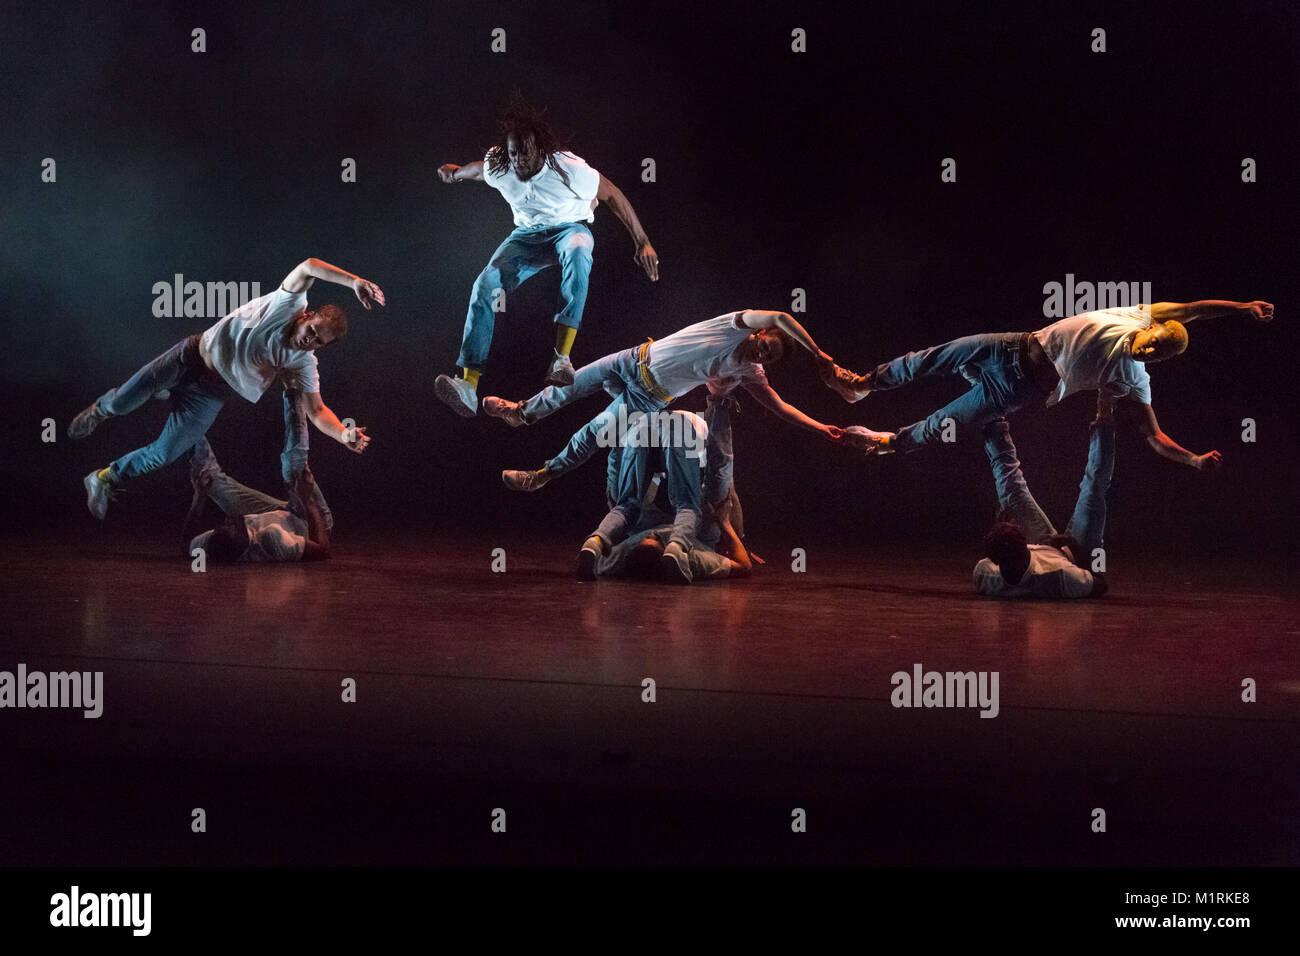 Sadler's Wells Theatre, London, UK, 1st Feb 2018. French b-boy crew Yeah Yellow present and energetic hip hop dance - Stock Image